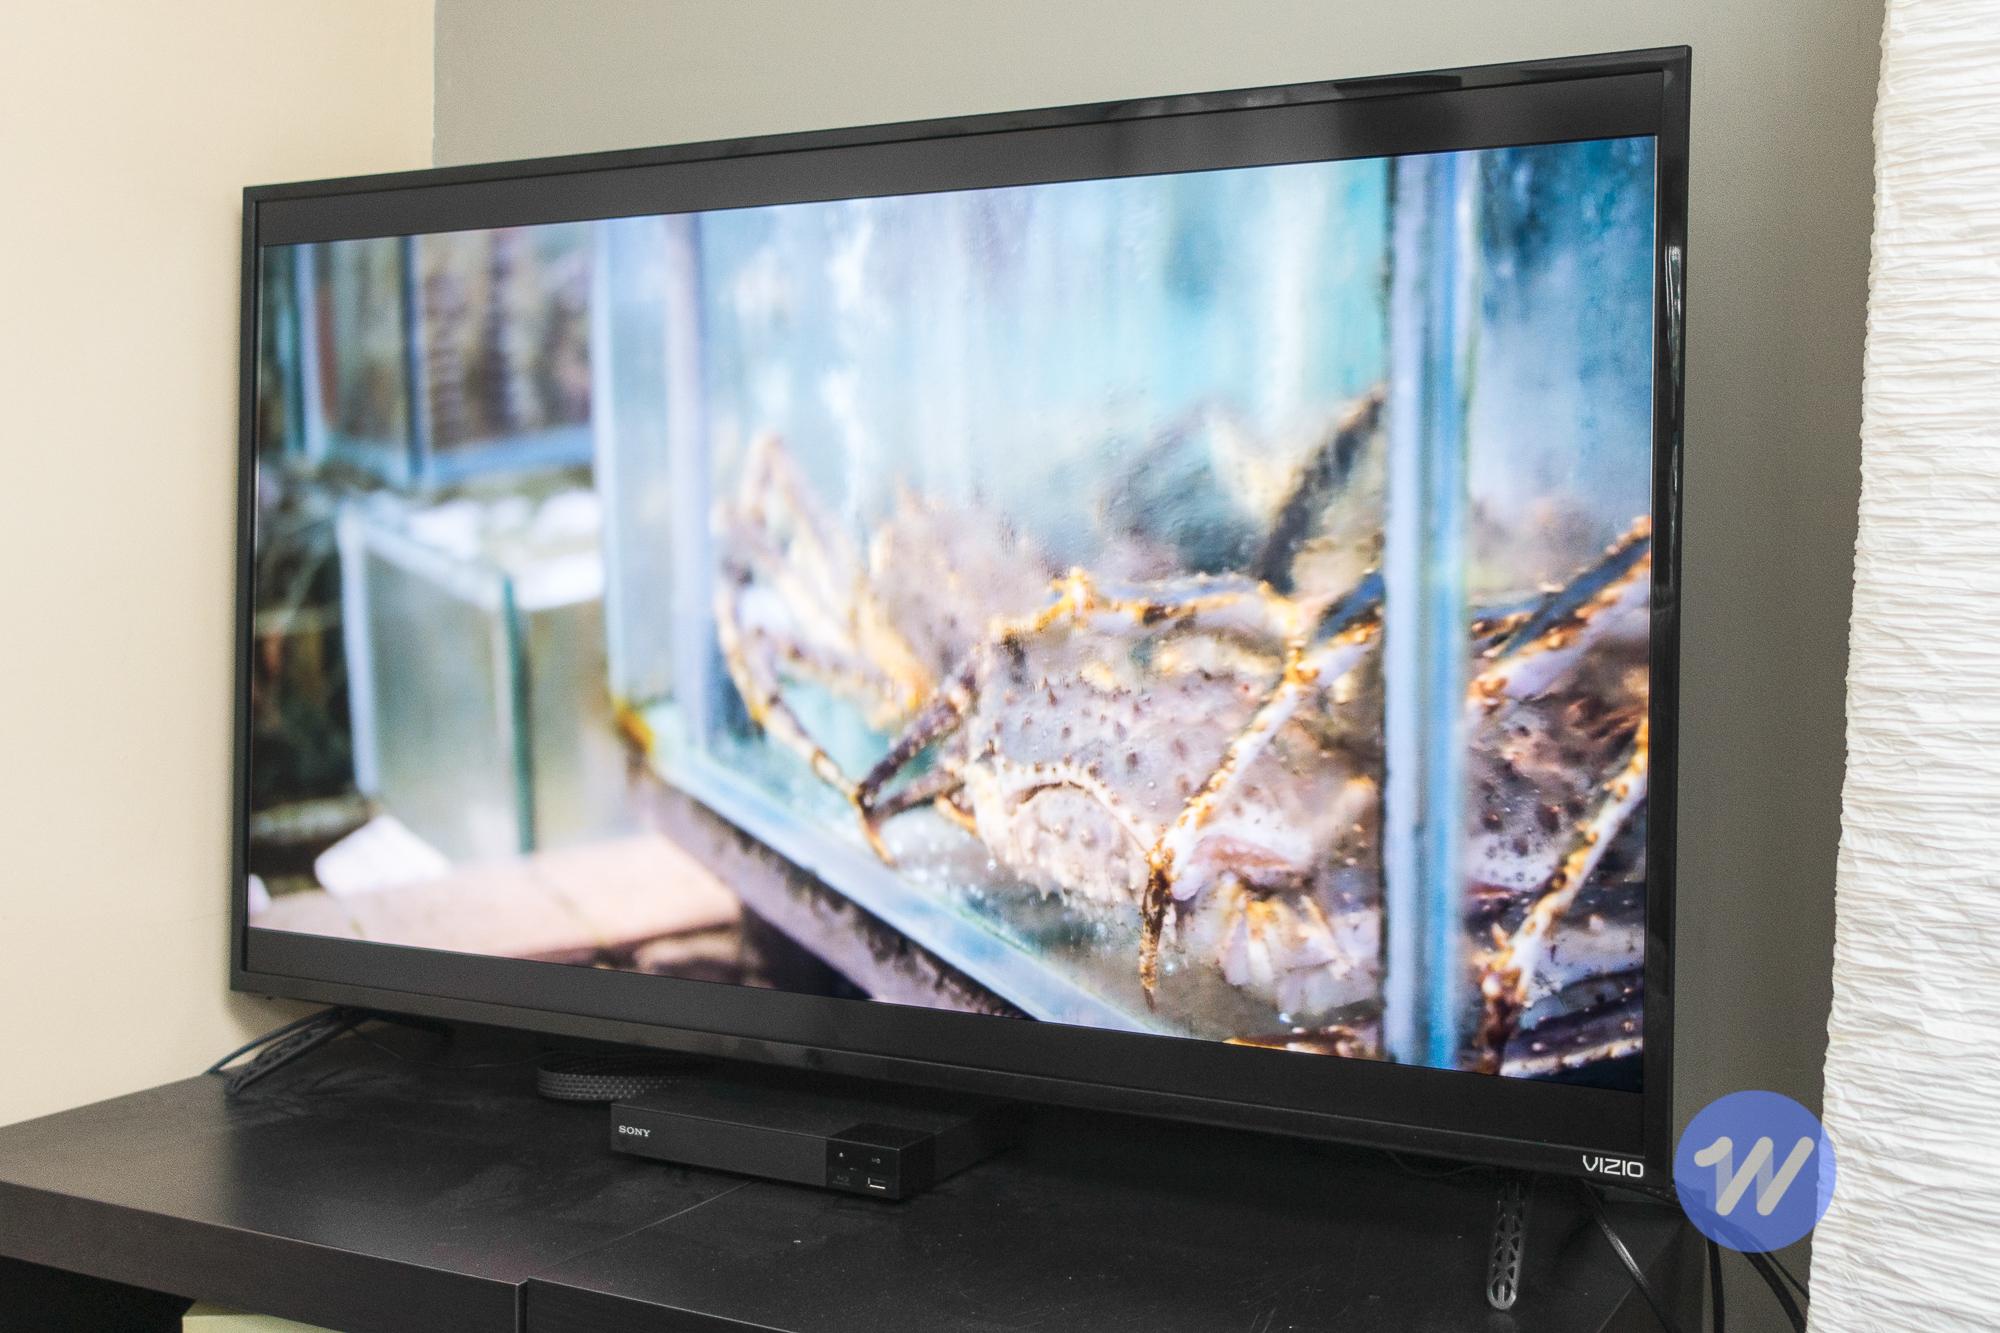 Wire Cutter Best 4k Tv Center Origami Shield Cartographer39s The On A Budget Rh Engadget Com Benq 50 Inch 240hz